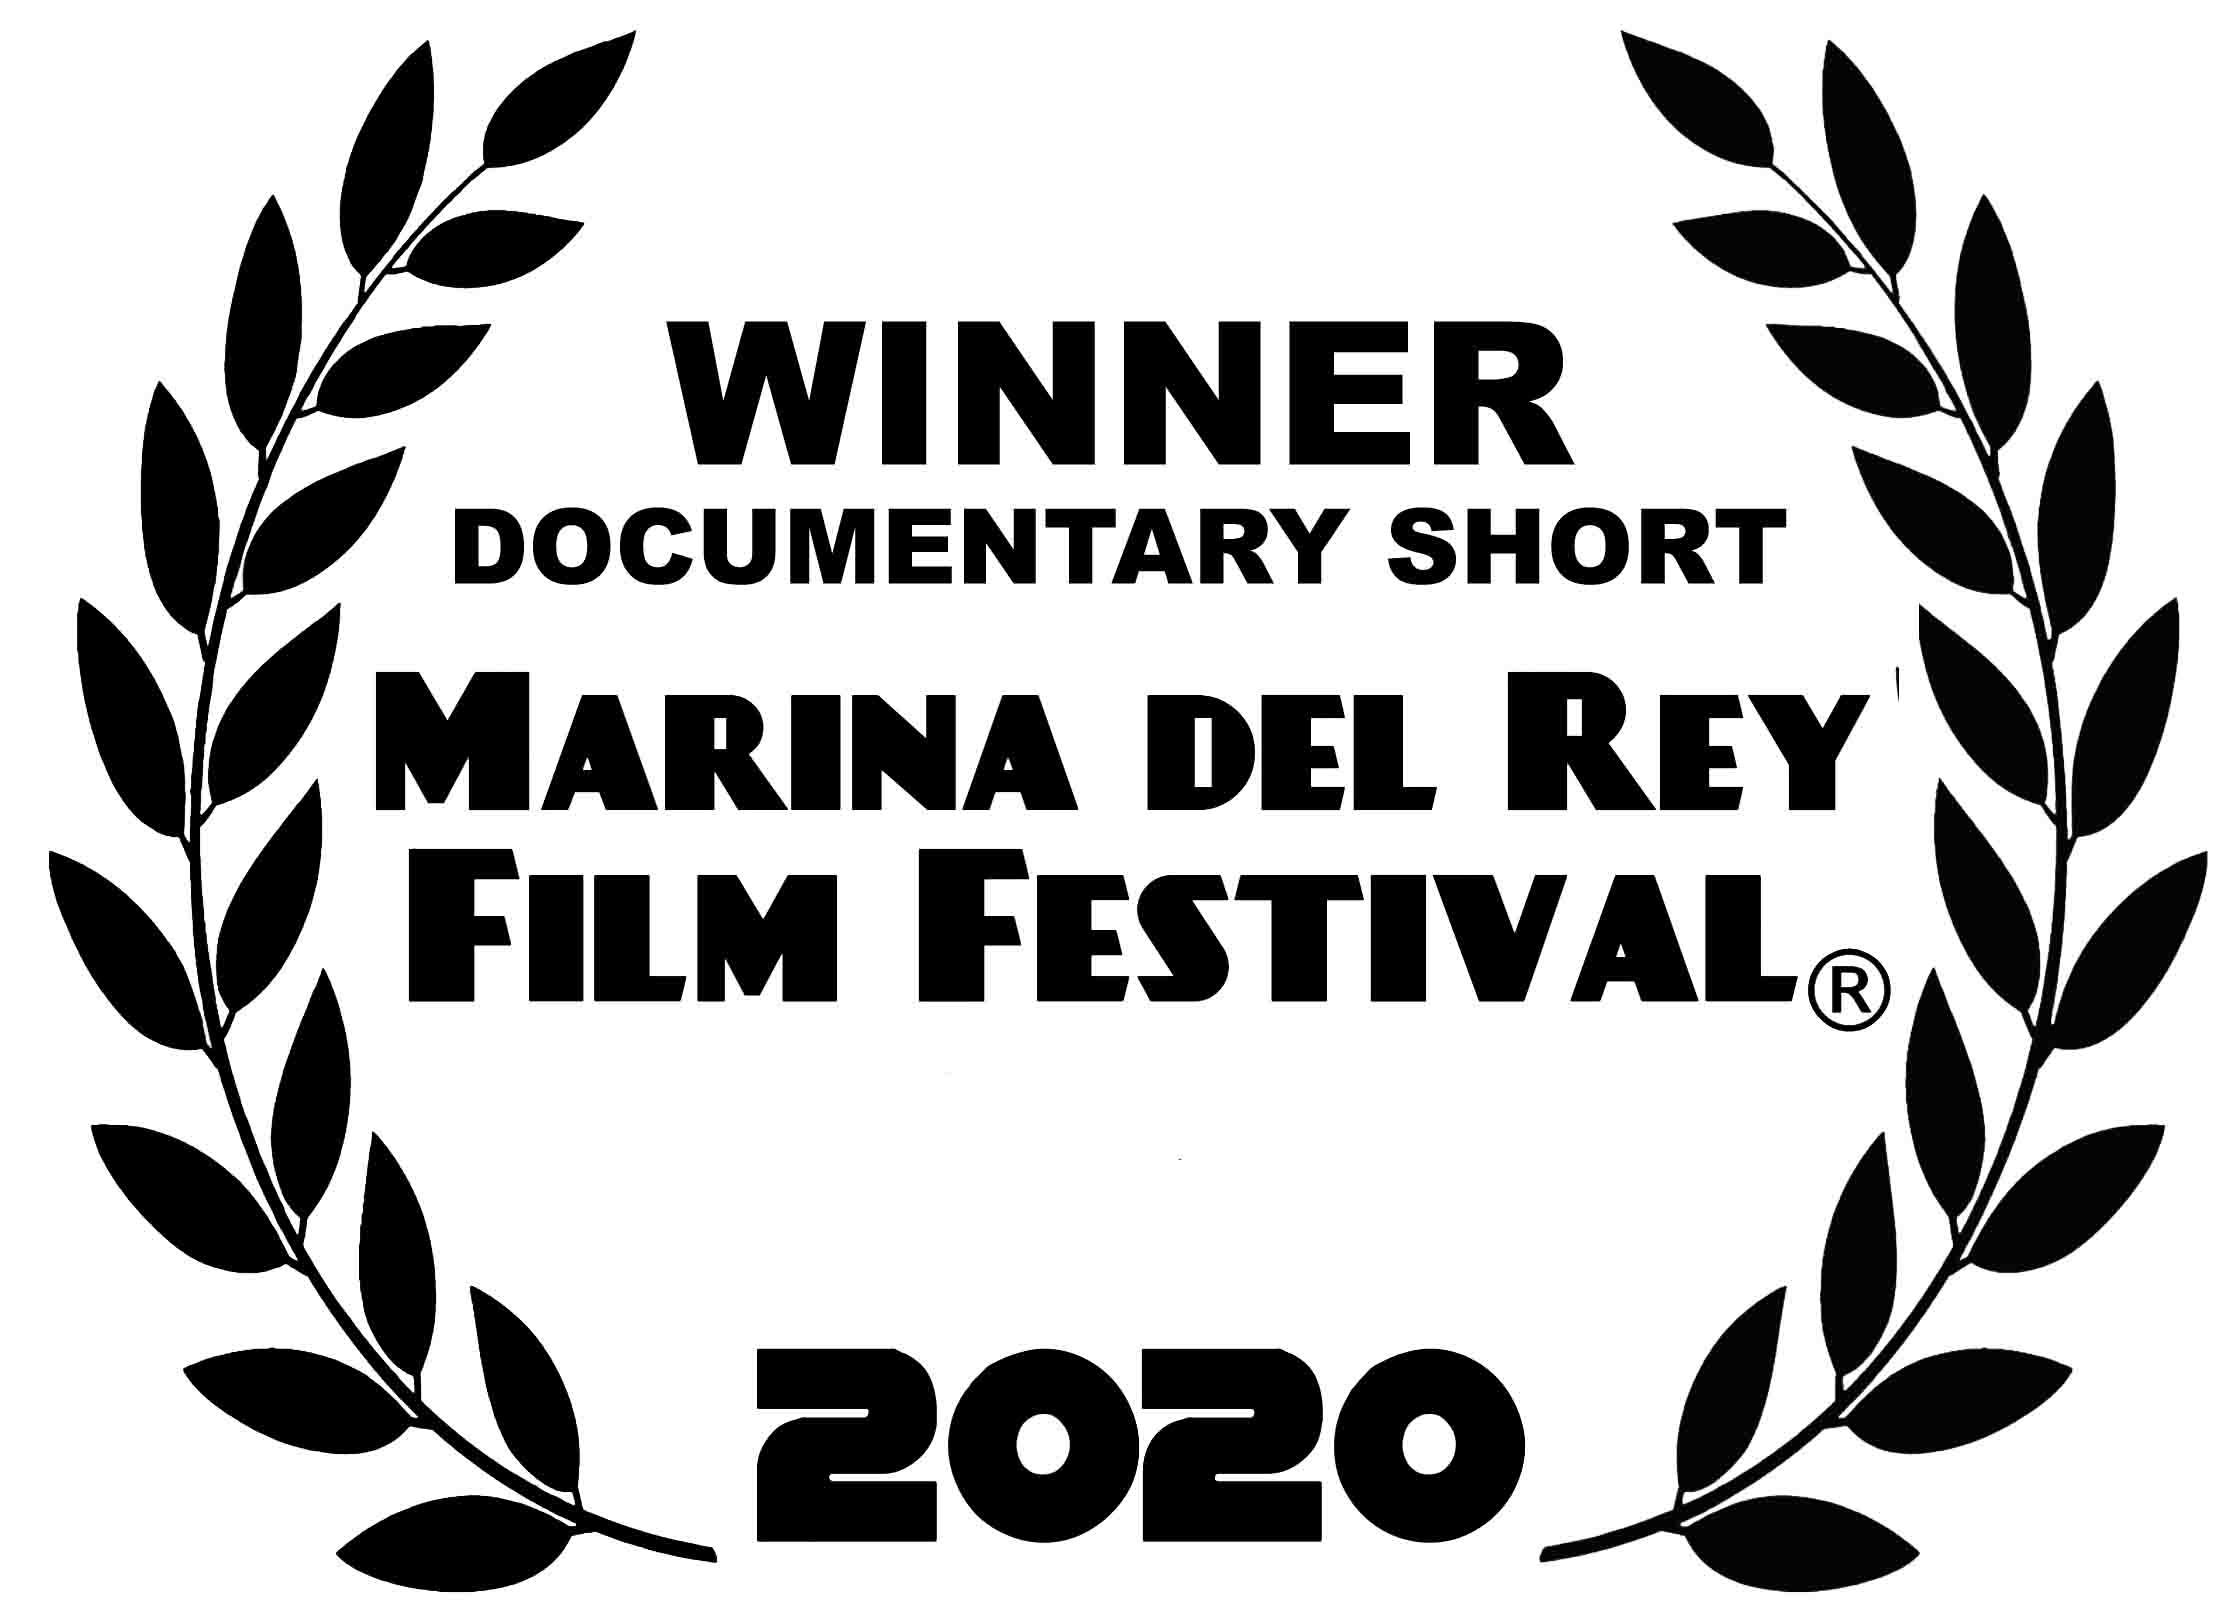 Marina del Rey Film Festival Laurel OS 2020